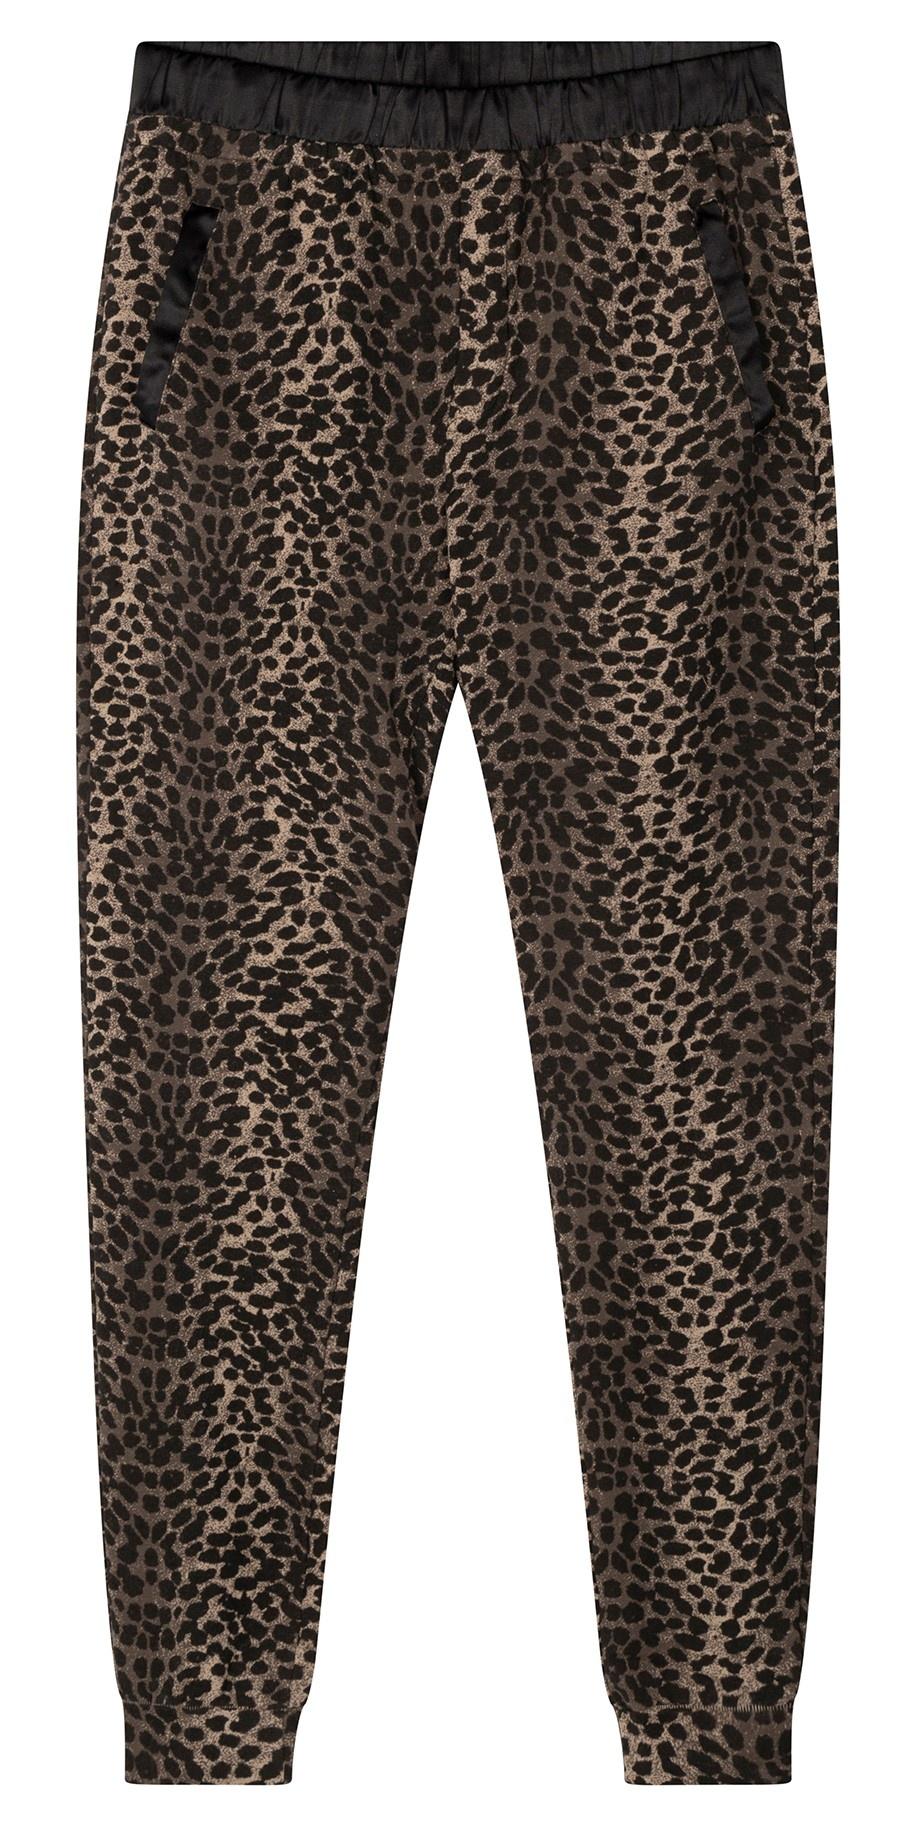 Broek jogger leopard camo desert taupe-2